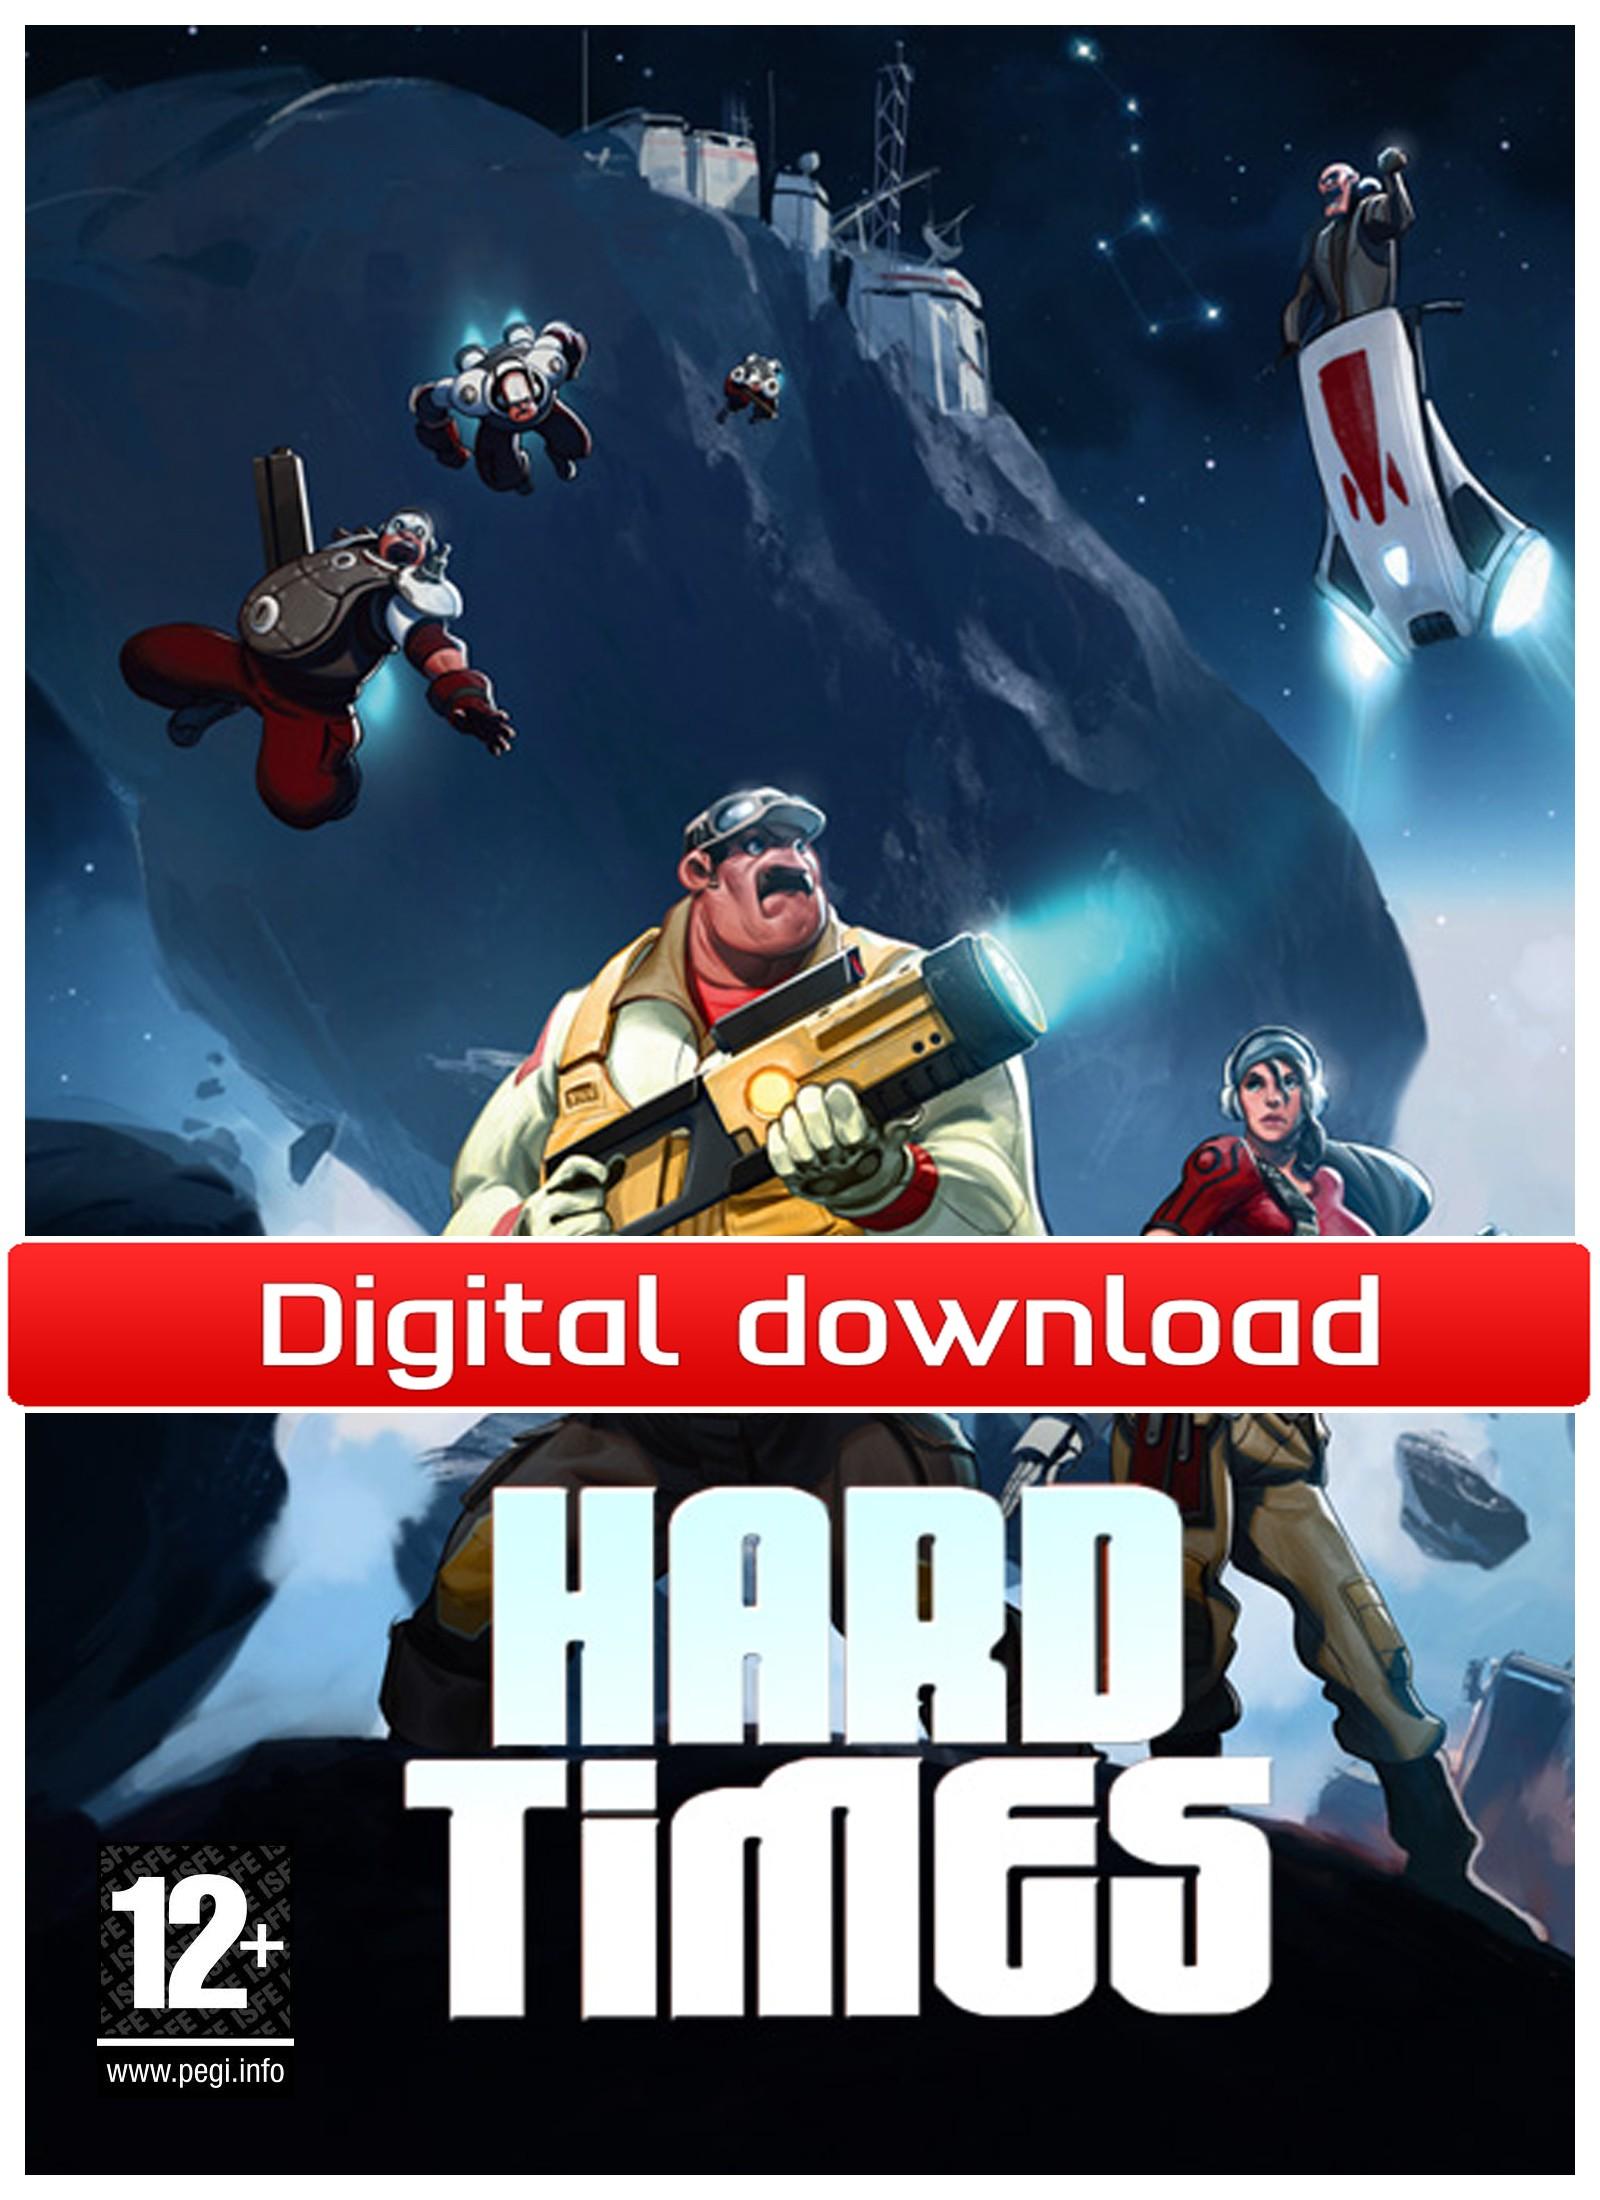 Rochard: Hard Times (PC nedlastning) PCDD31978